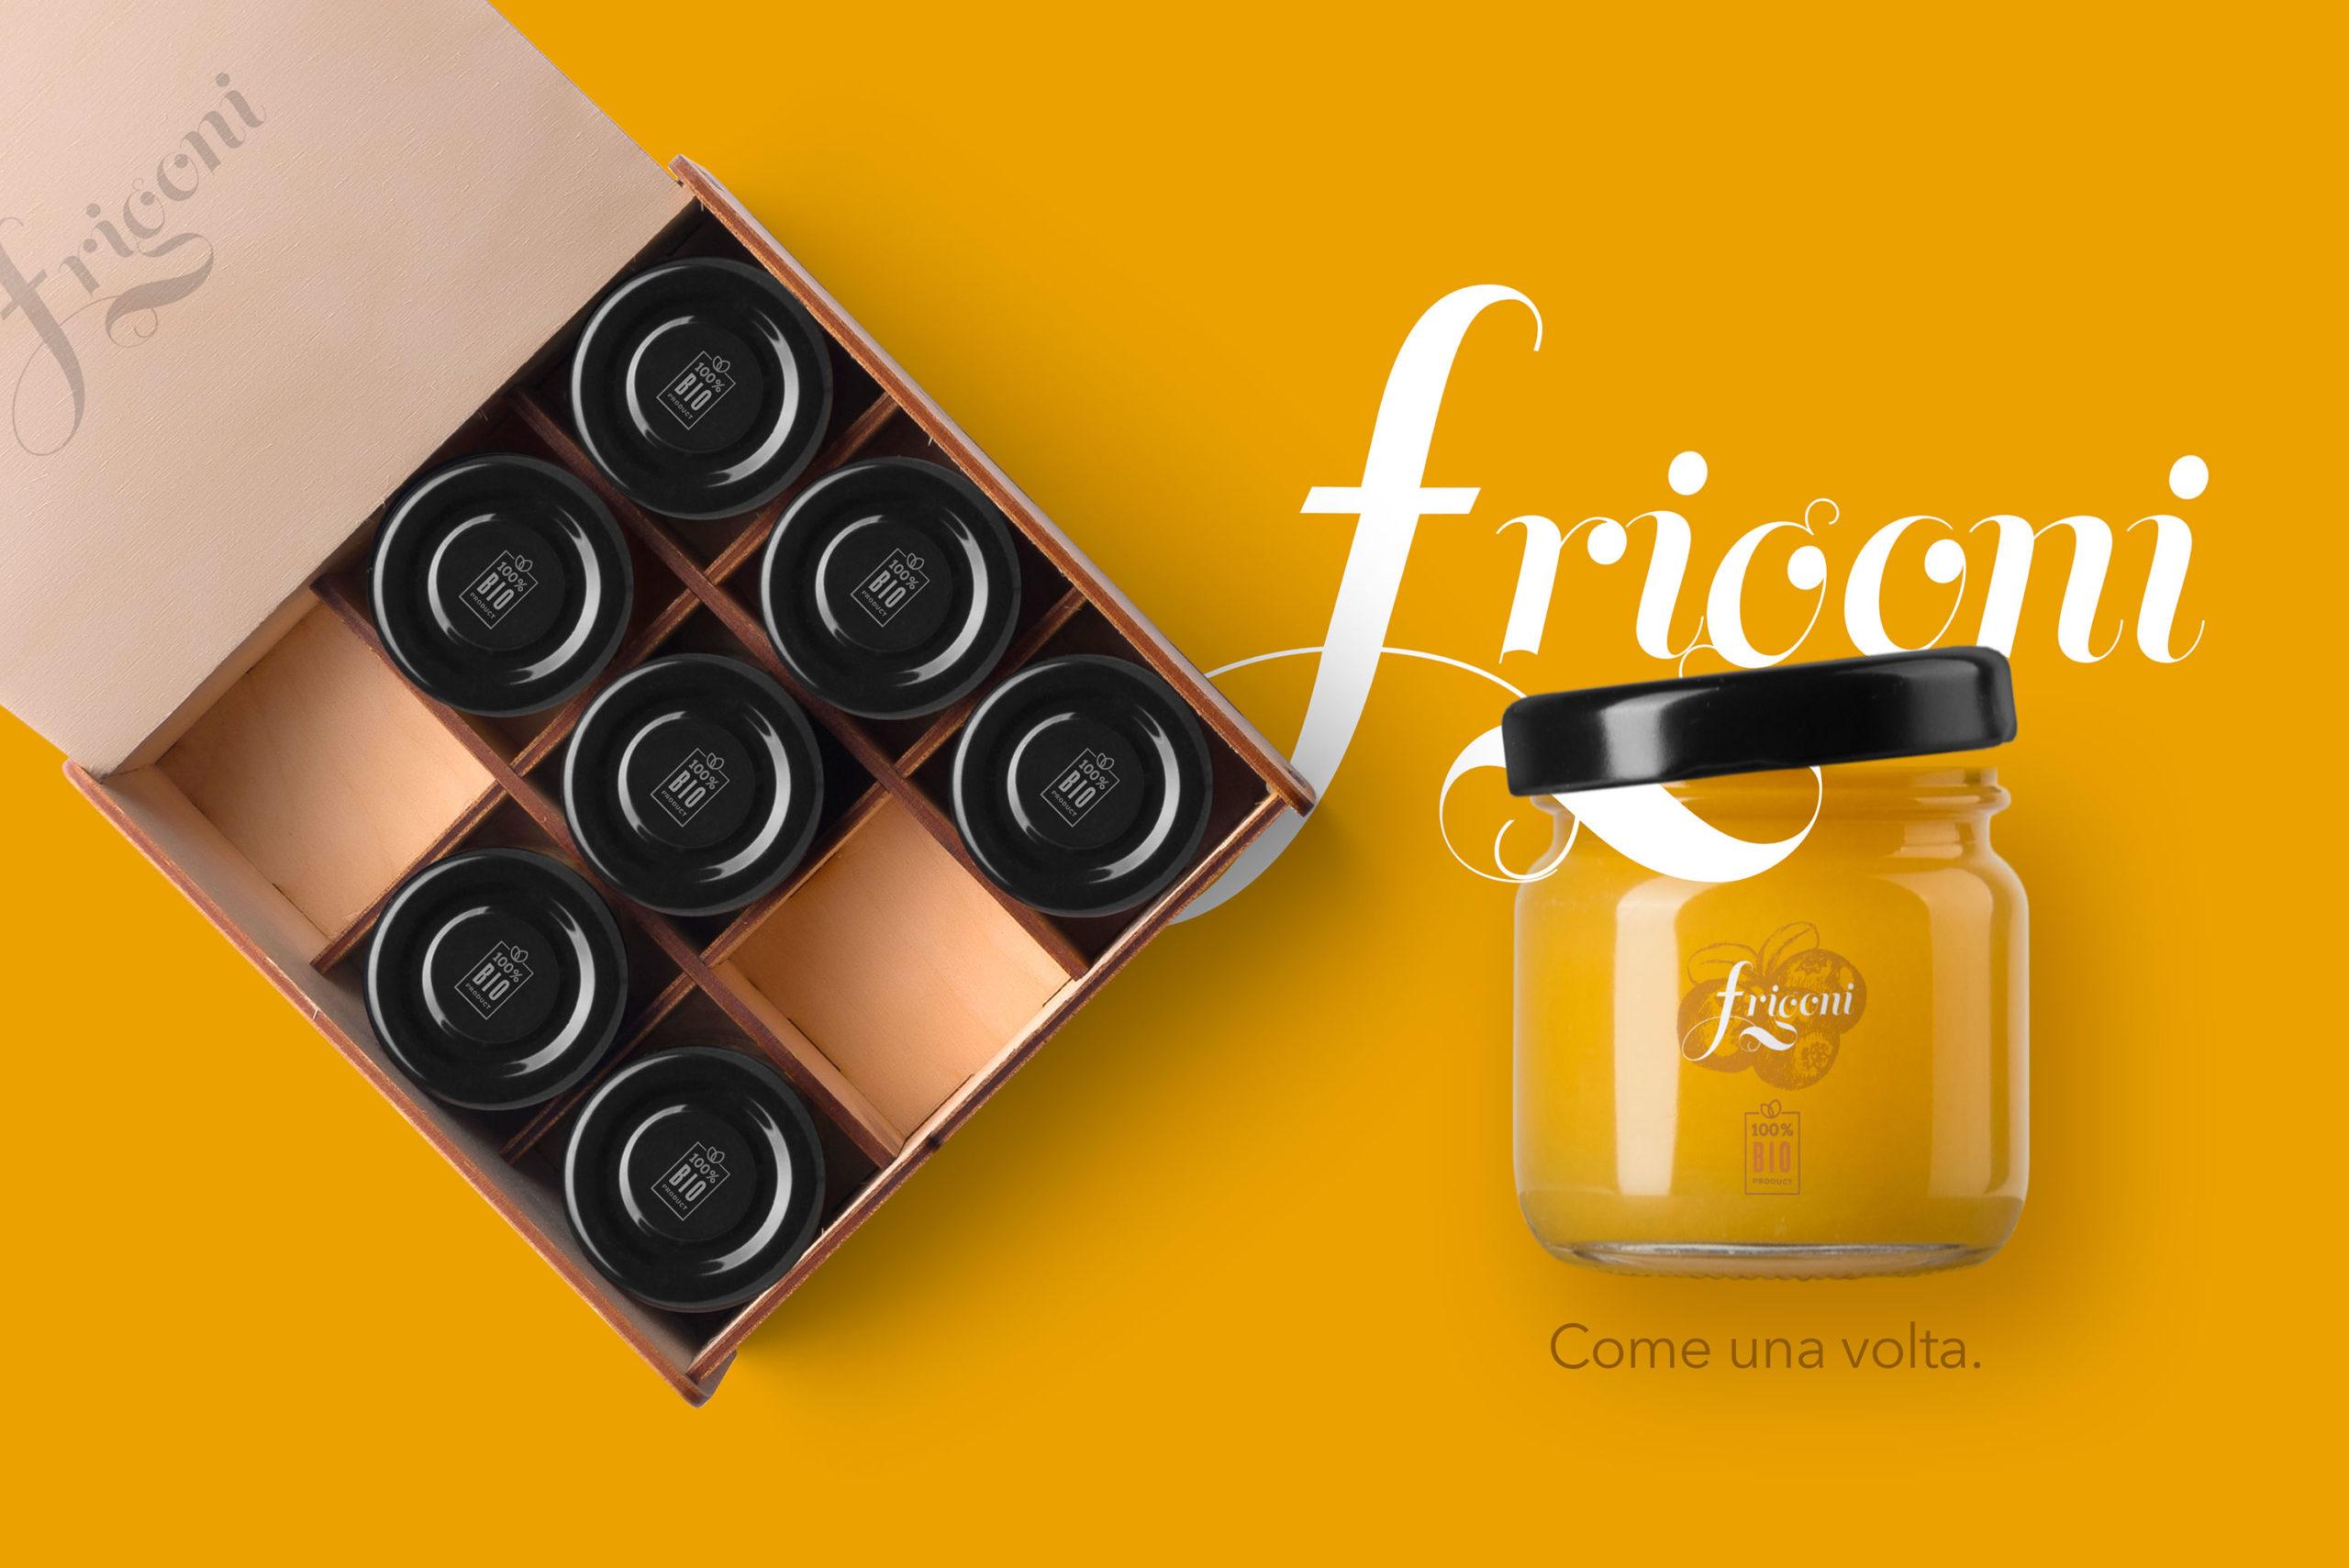 Frigoni – Firenze, IT / MAR 2020